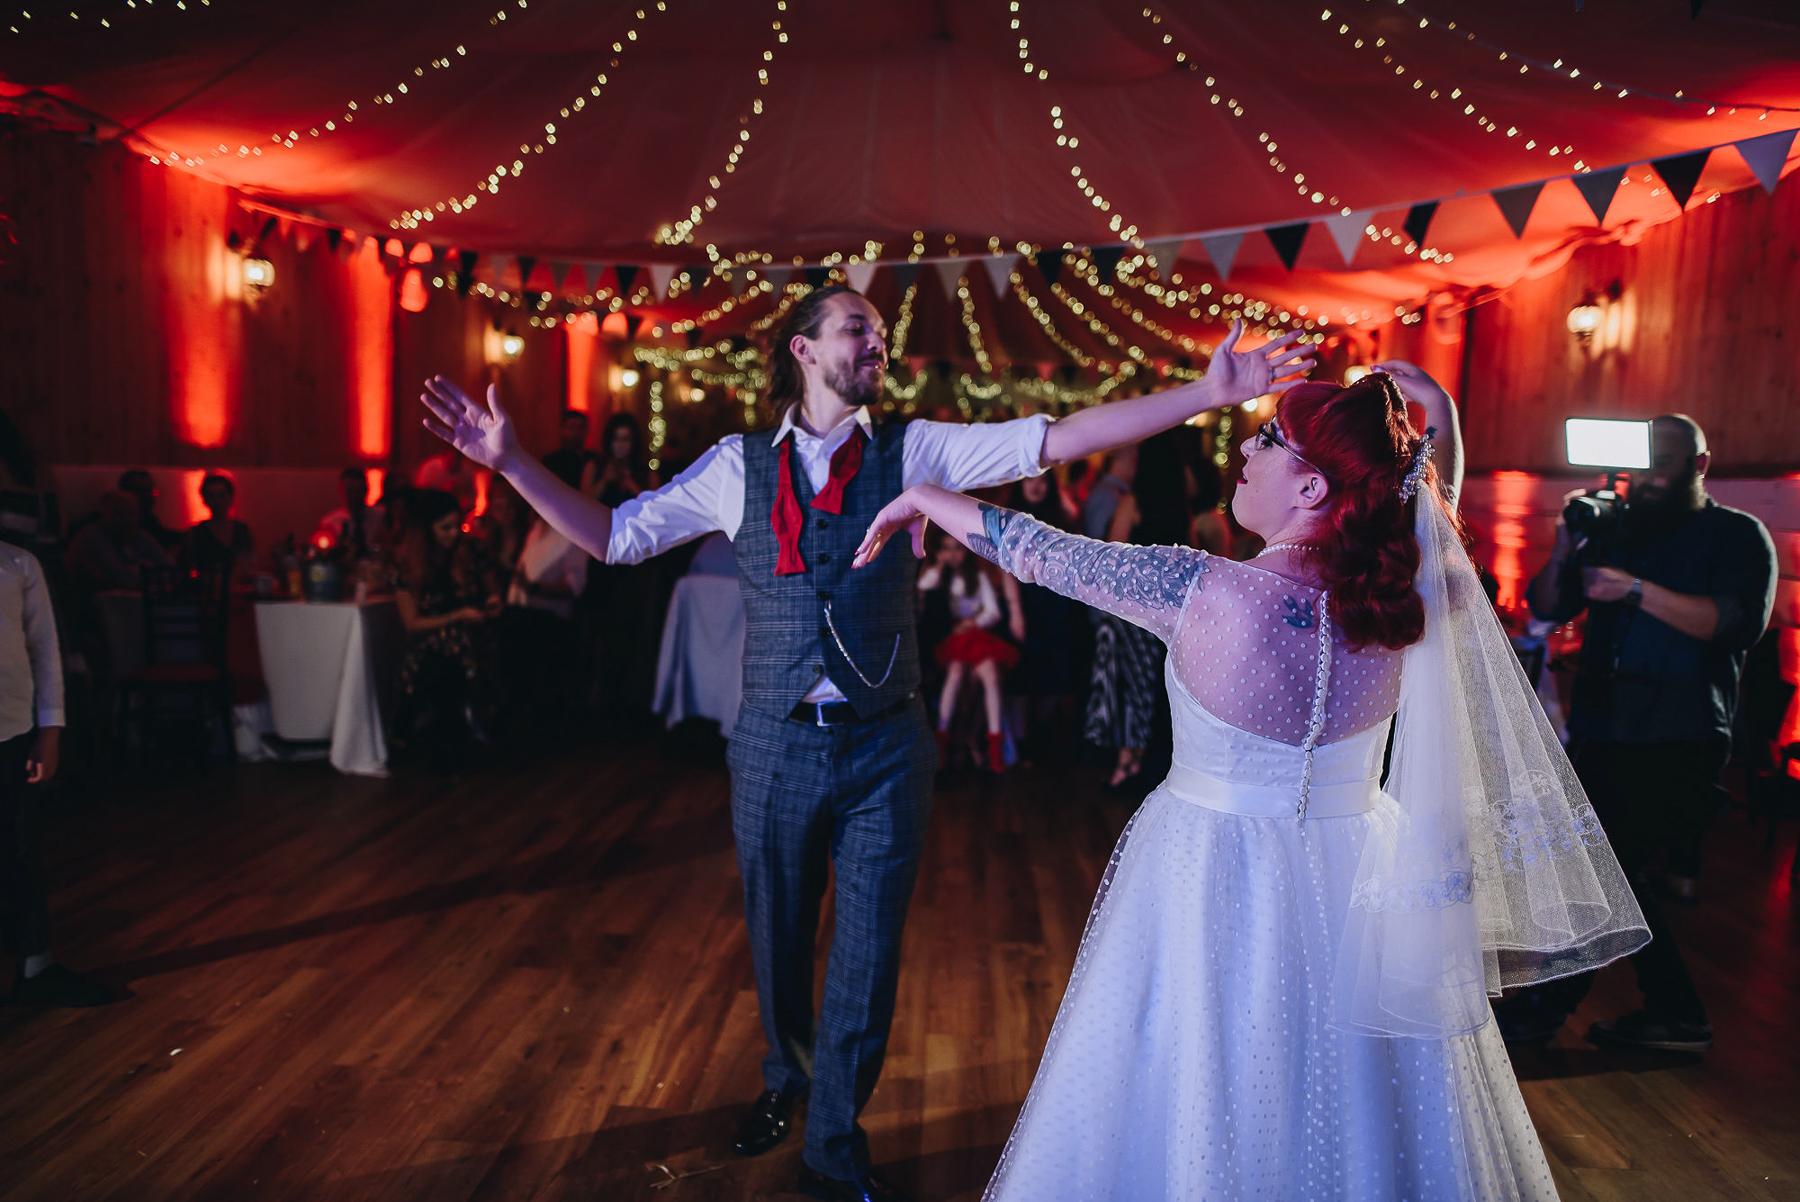 Wellbeing_Farm_Wedding_Photography_The_Pin-Up_Bride_Lara_Shaun-139.jpg